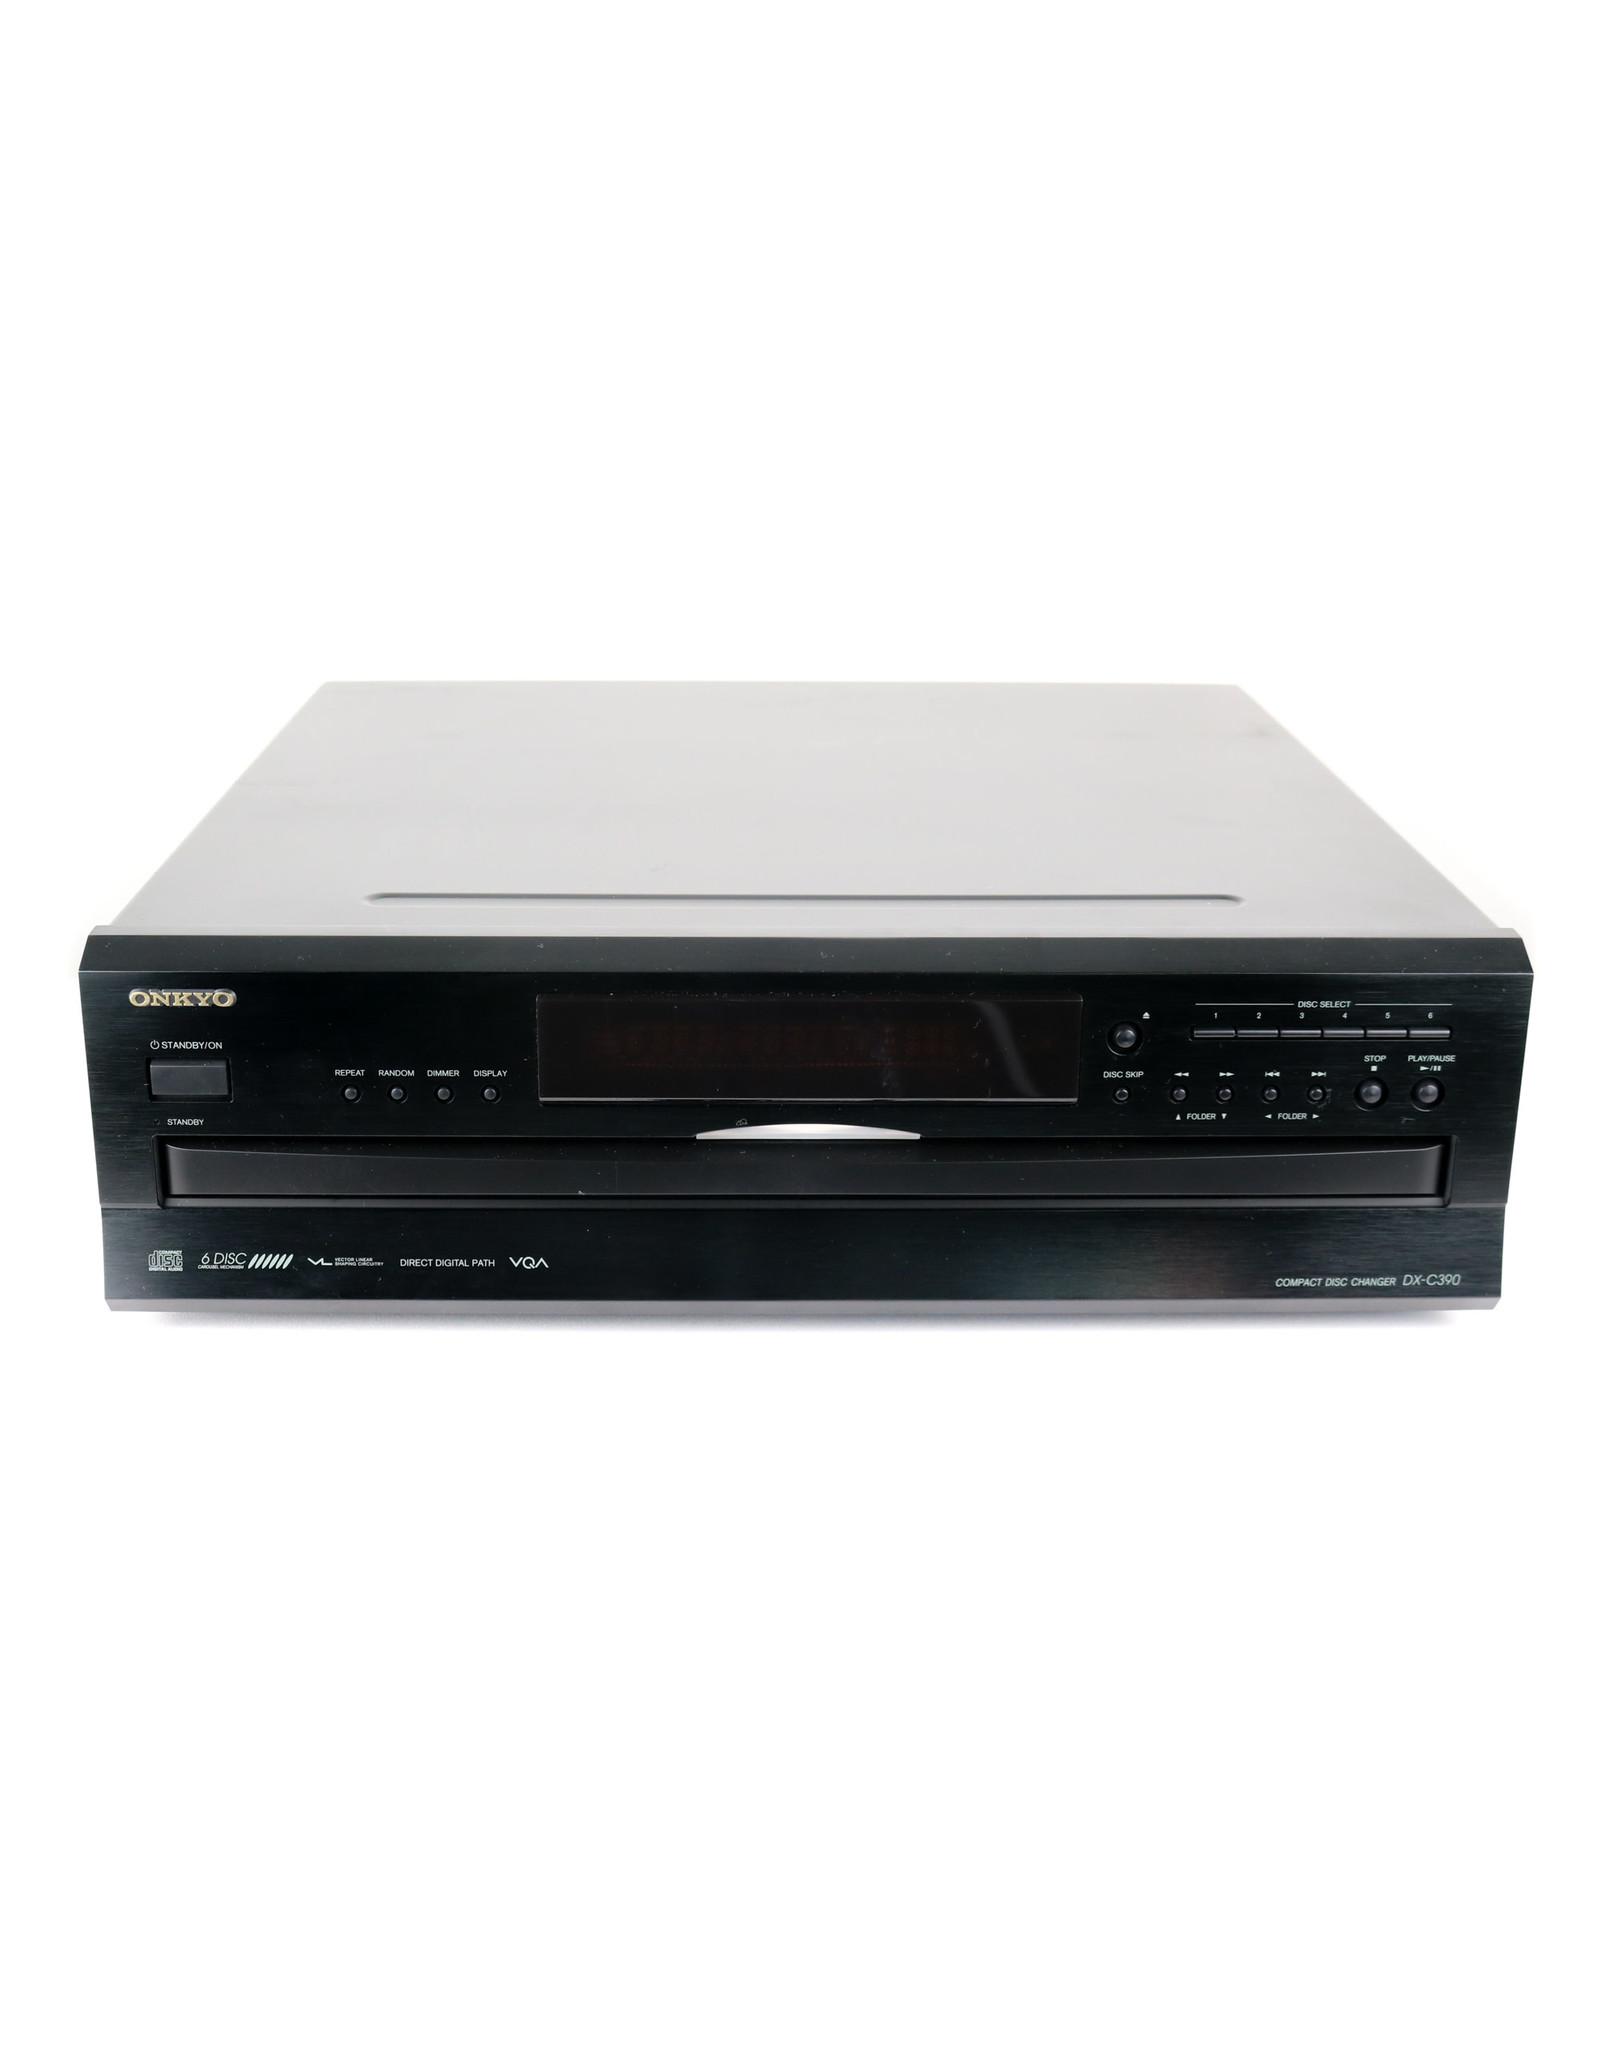 Onkyo Onkyo DX-C390 6-Disc CD Player USED